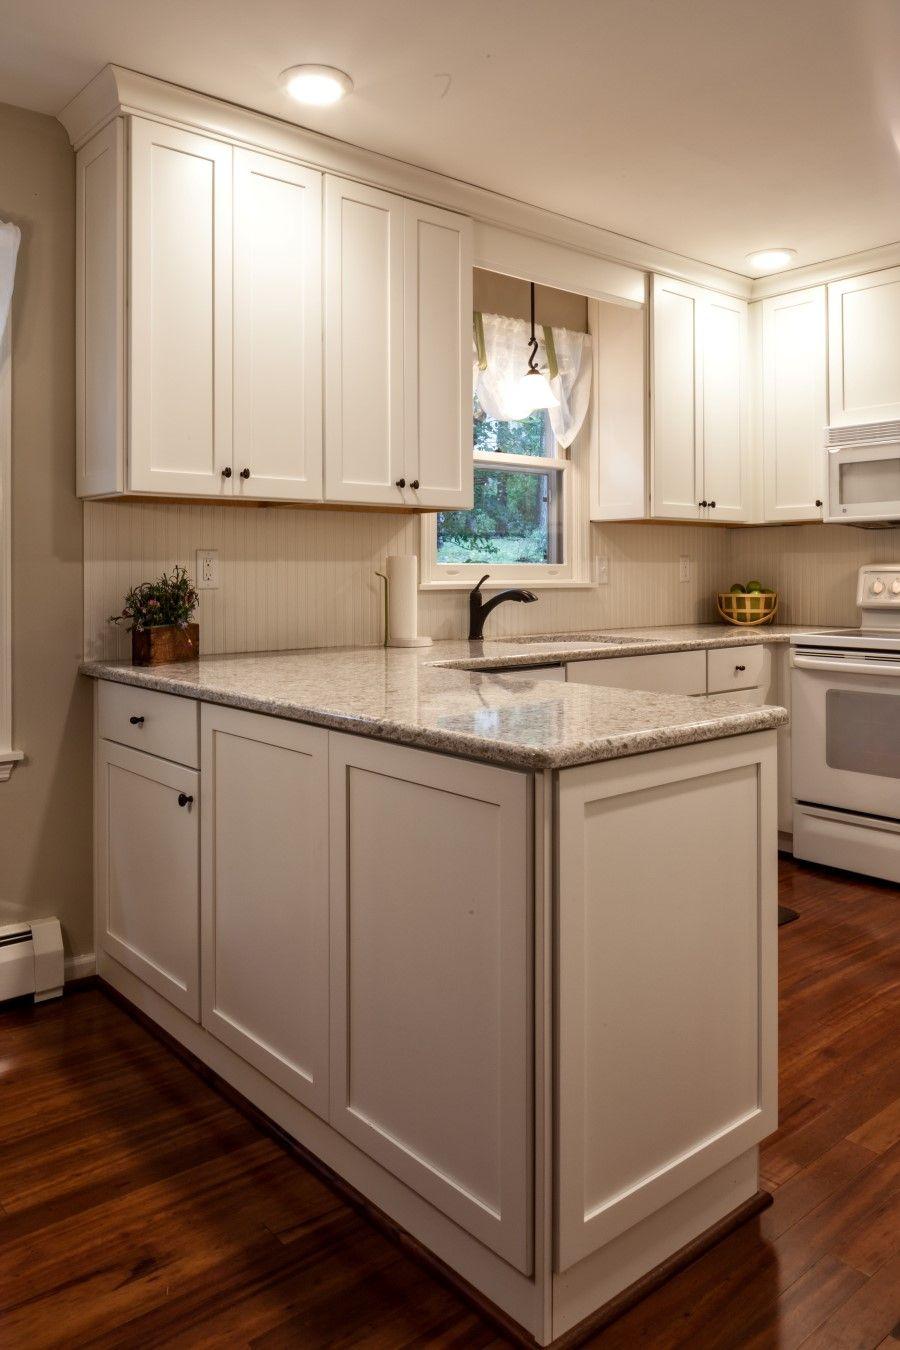 New Schrock Cabinetry and Silestone Quartz Countertops ...